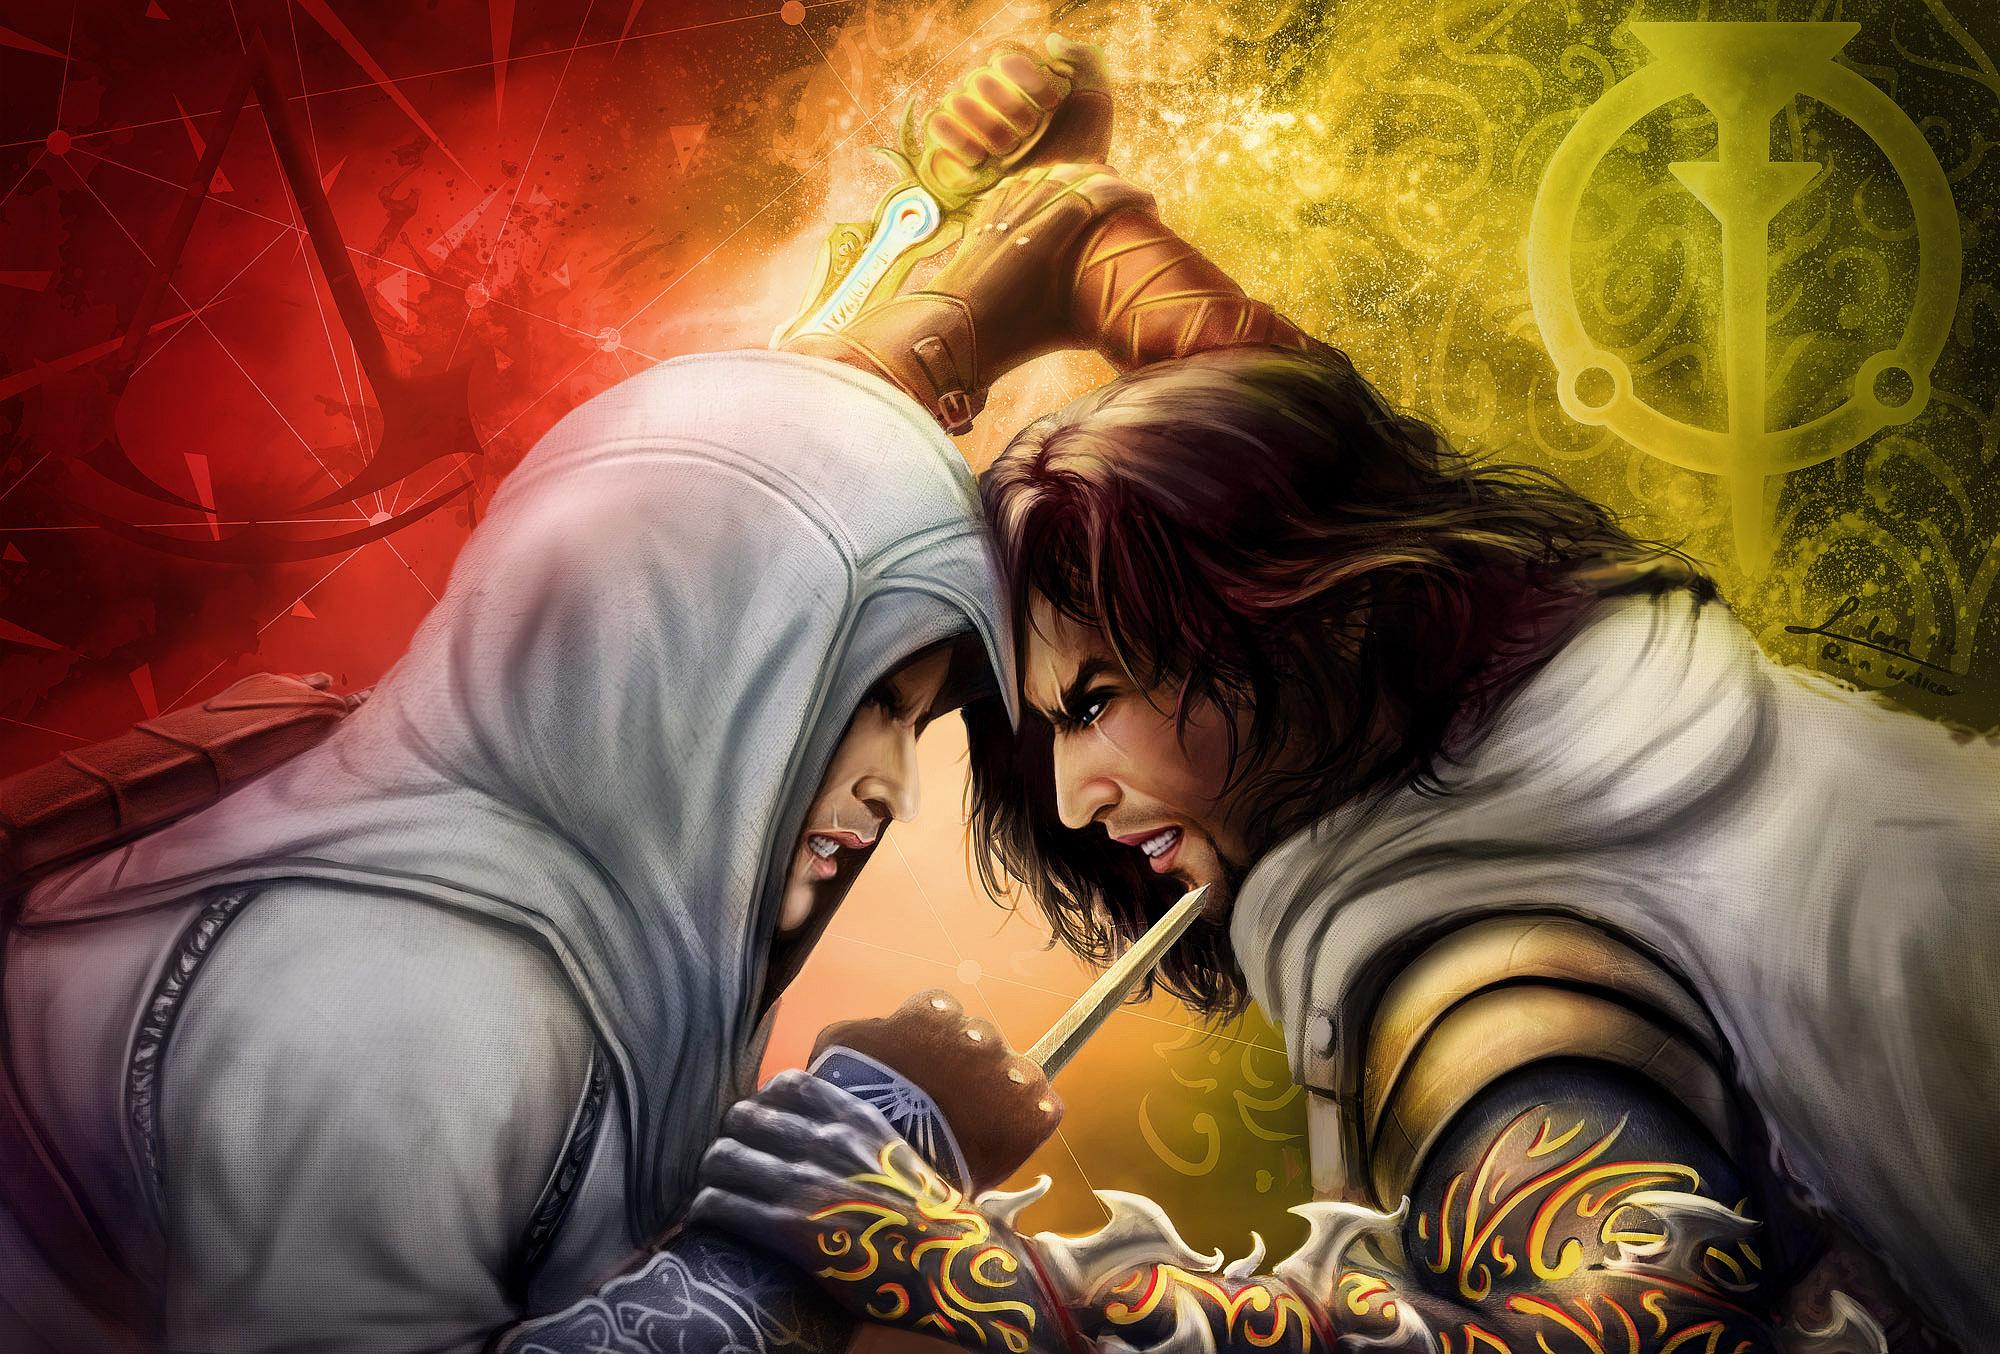 Prince of Persia VS Assassin Creed